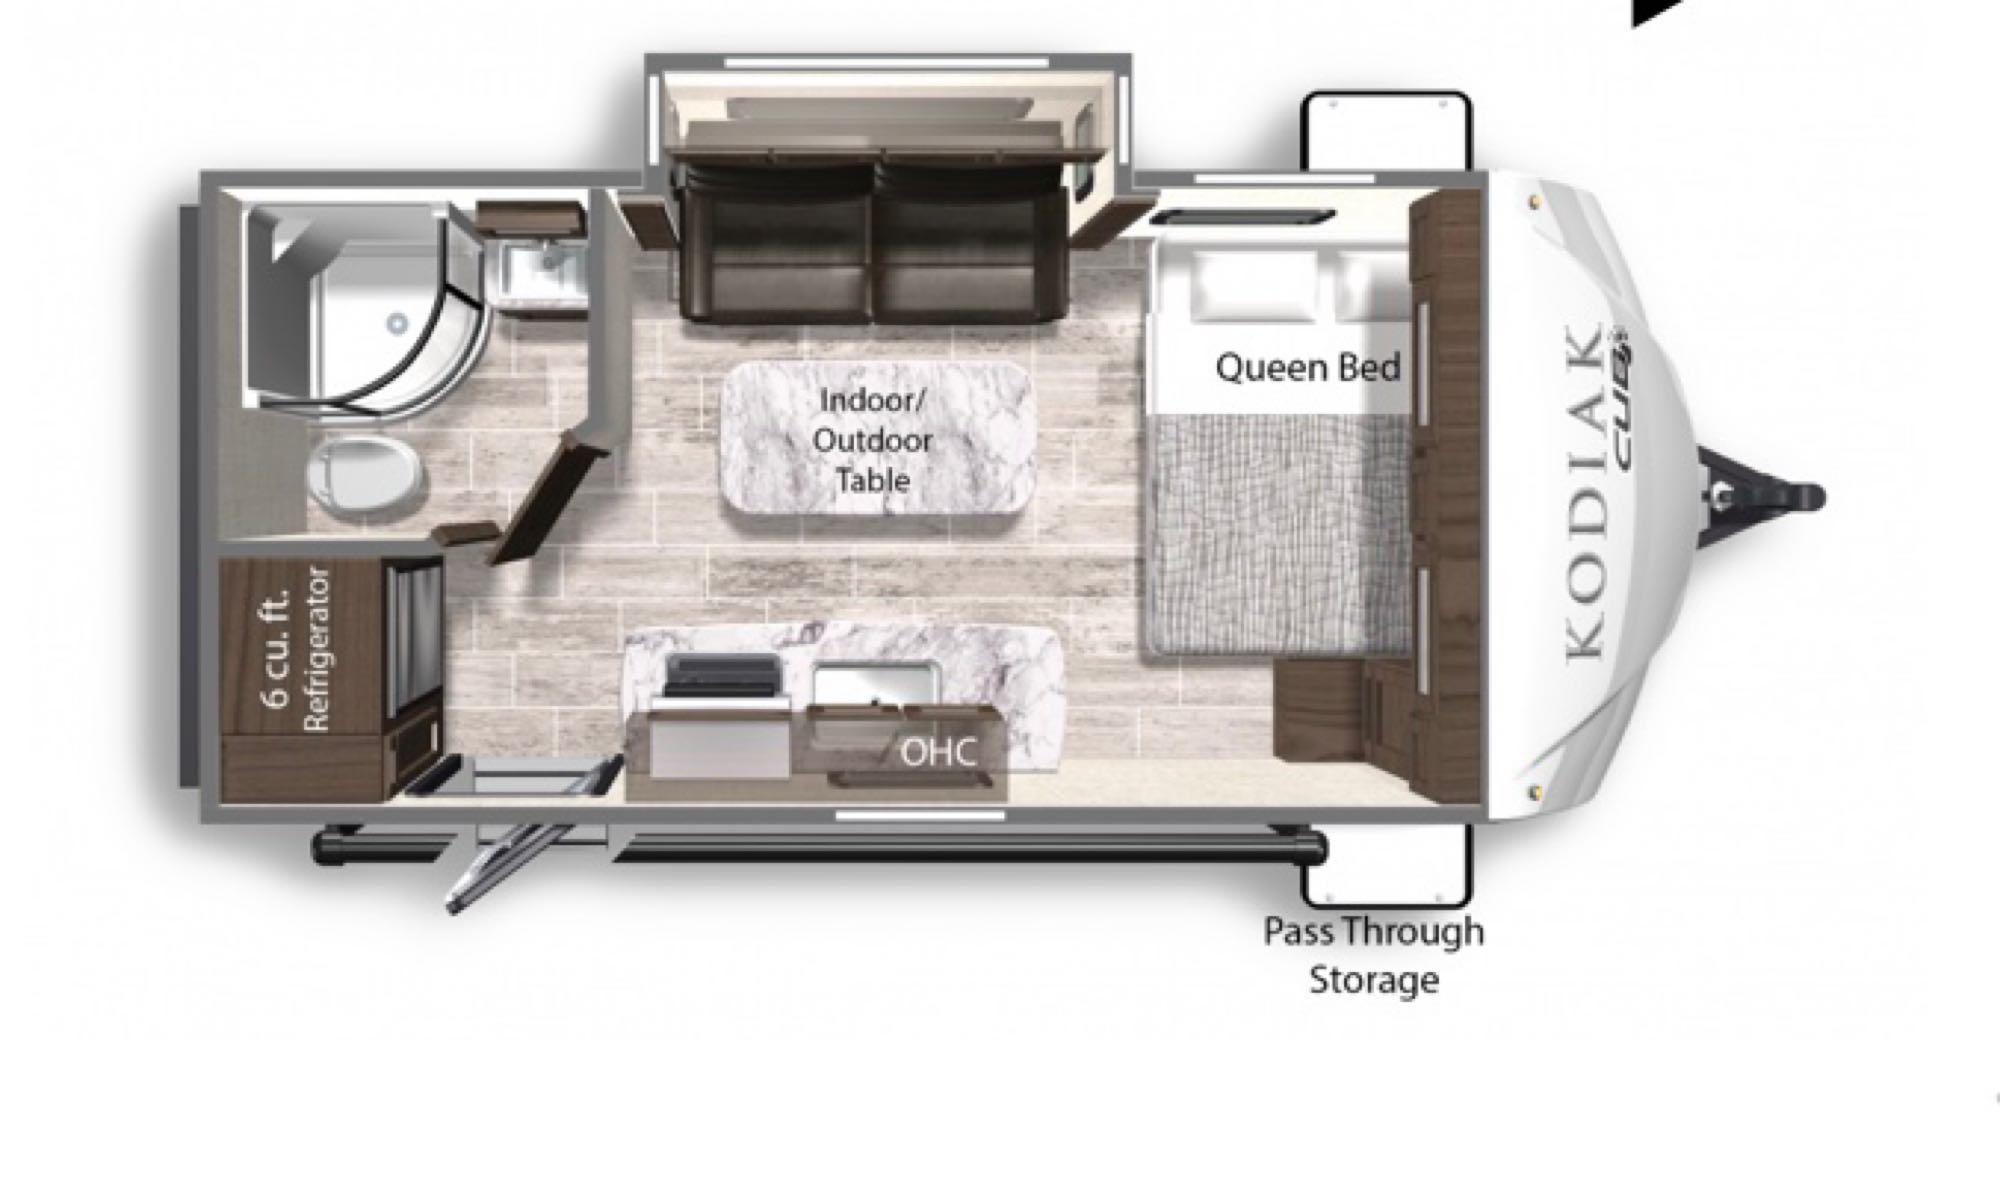 Floor Plan. Dutchmen Kodiak Cub 178RB 2020